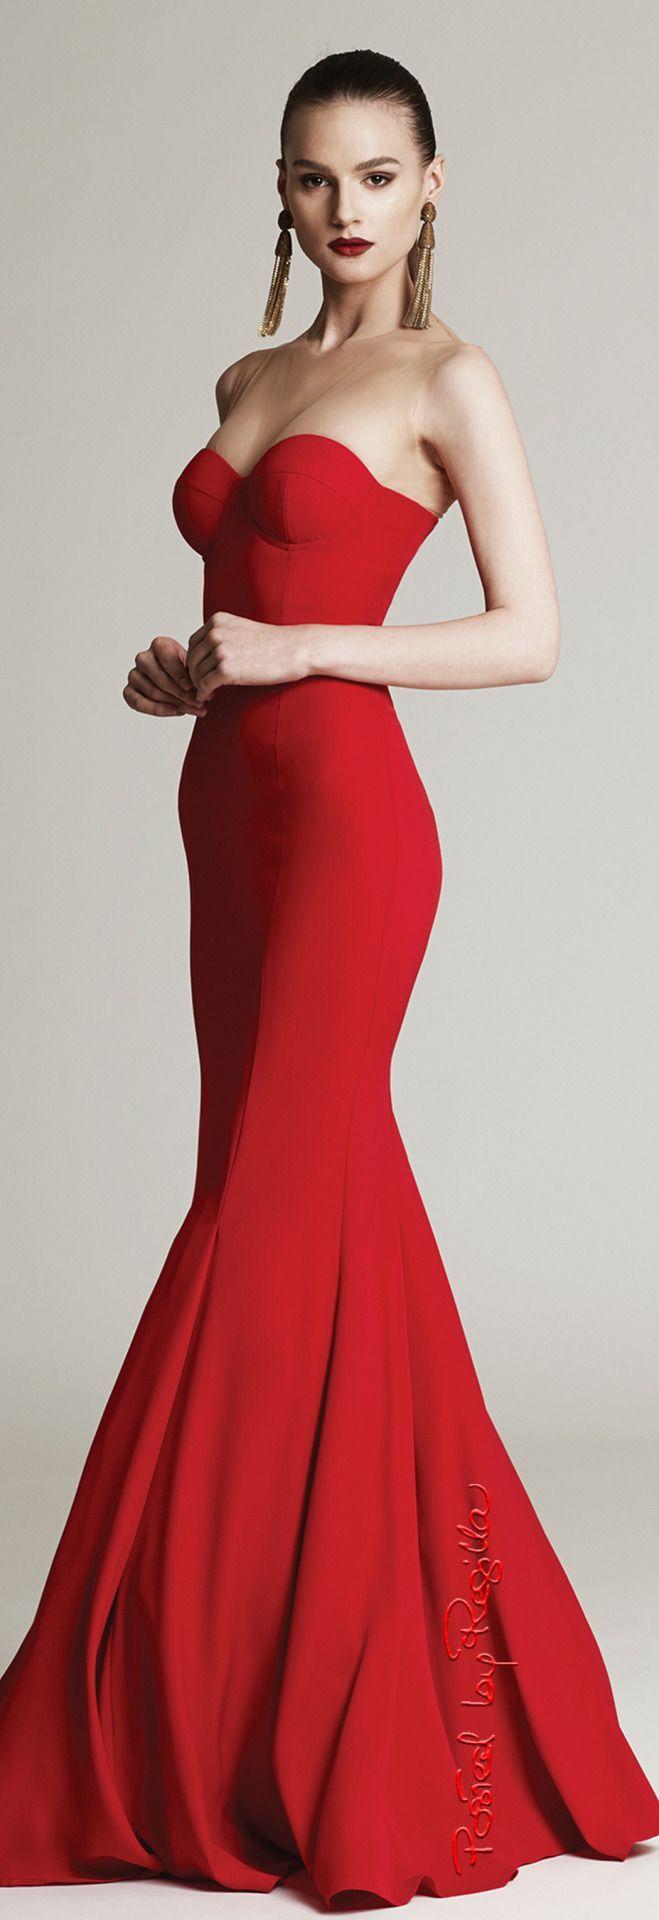 #Beautiful #women wearing  Red #Dresses